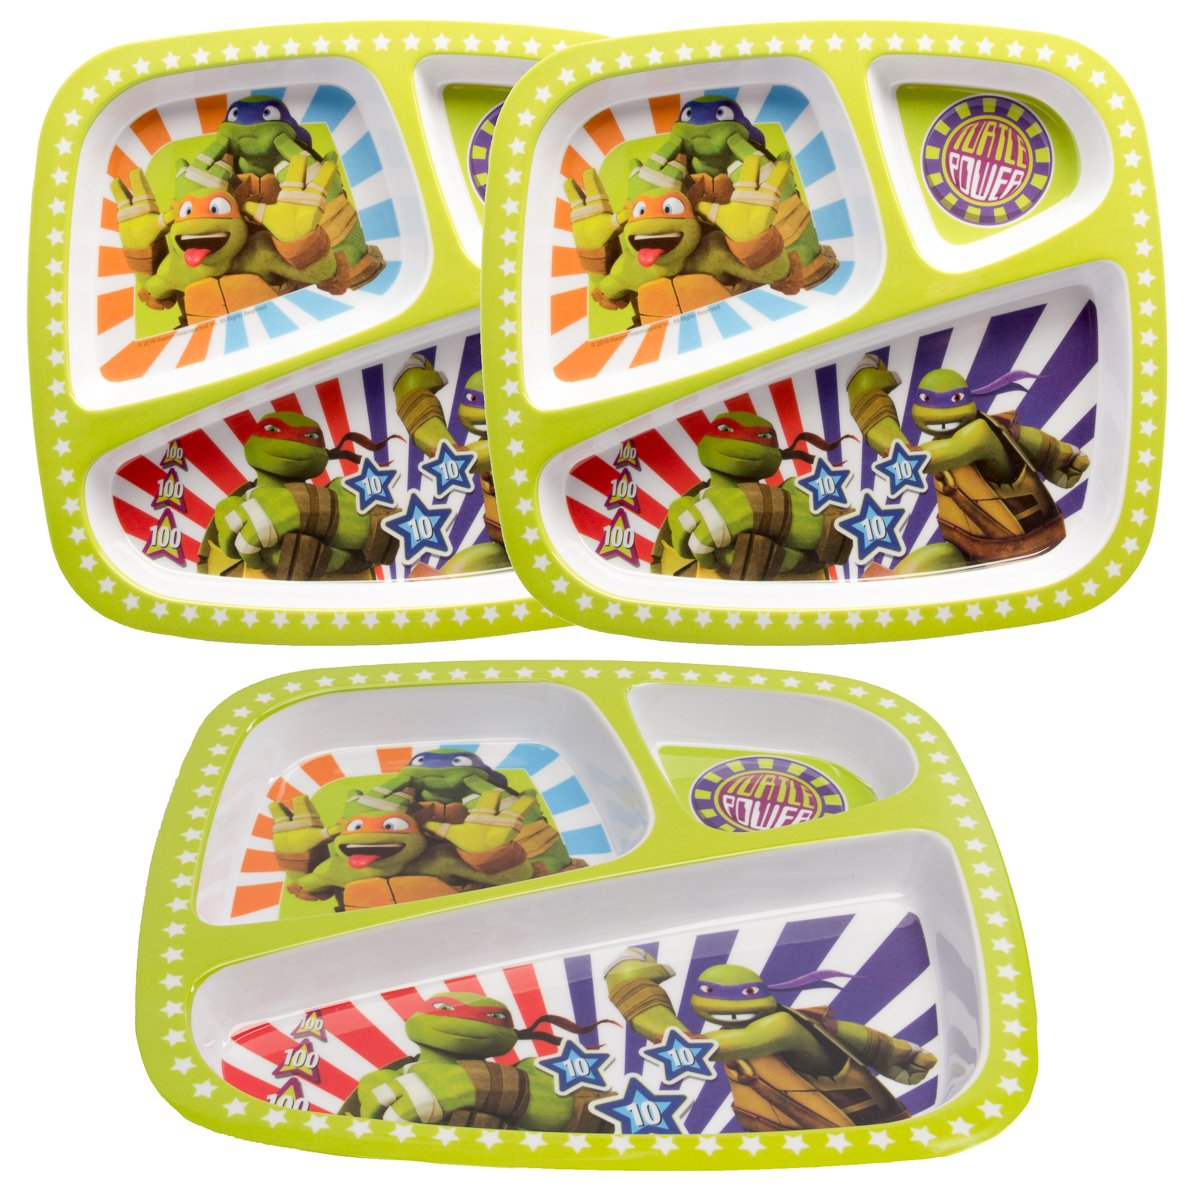 Zak! (3 Pack) Kids Teenage Mutant Ninja Turtles 3-Section Divided Compartment Plates TMNT Dishwasher Safe